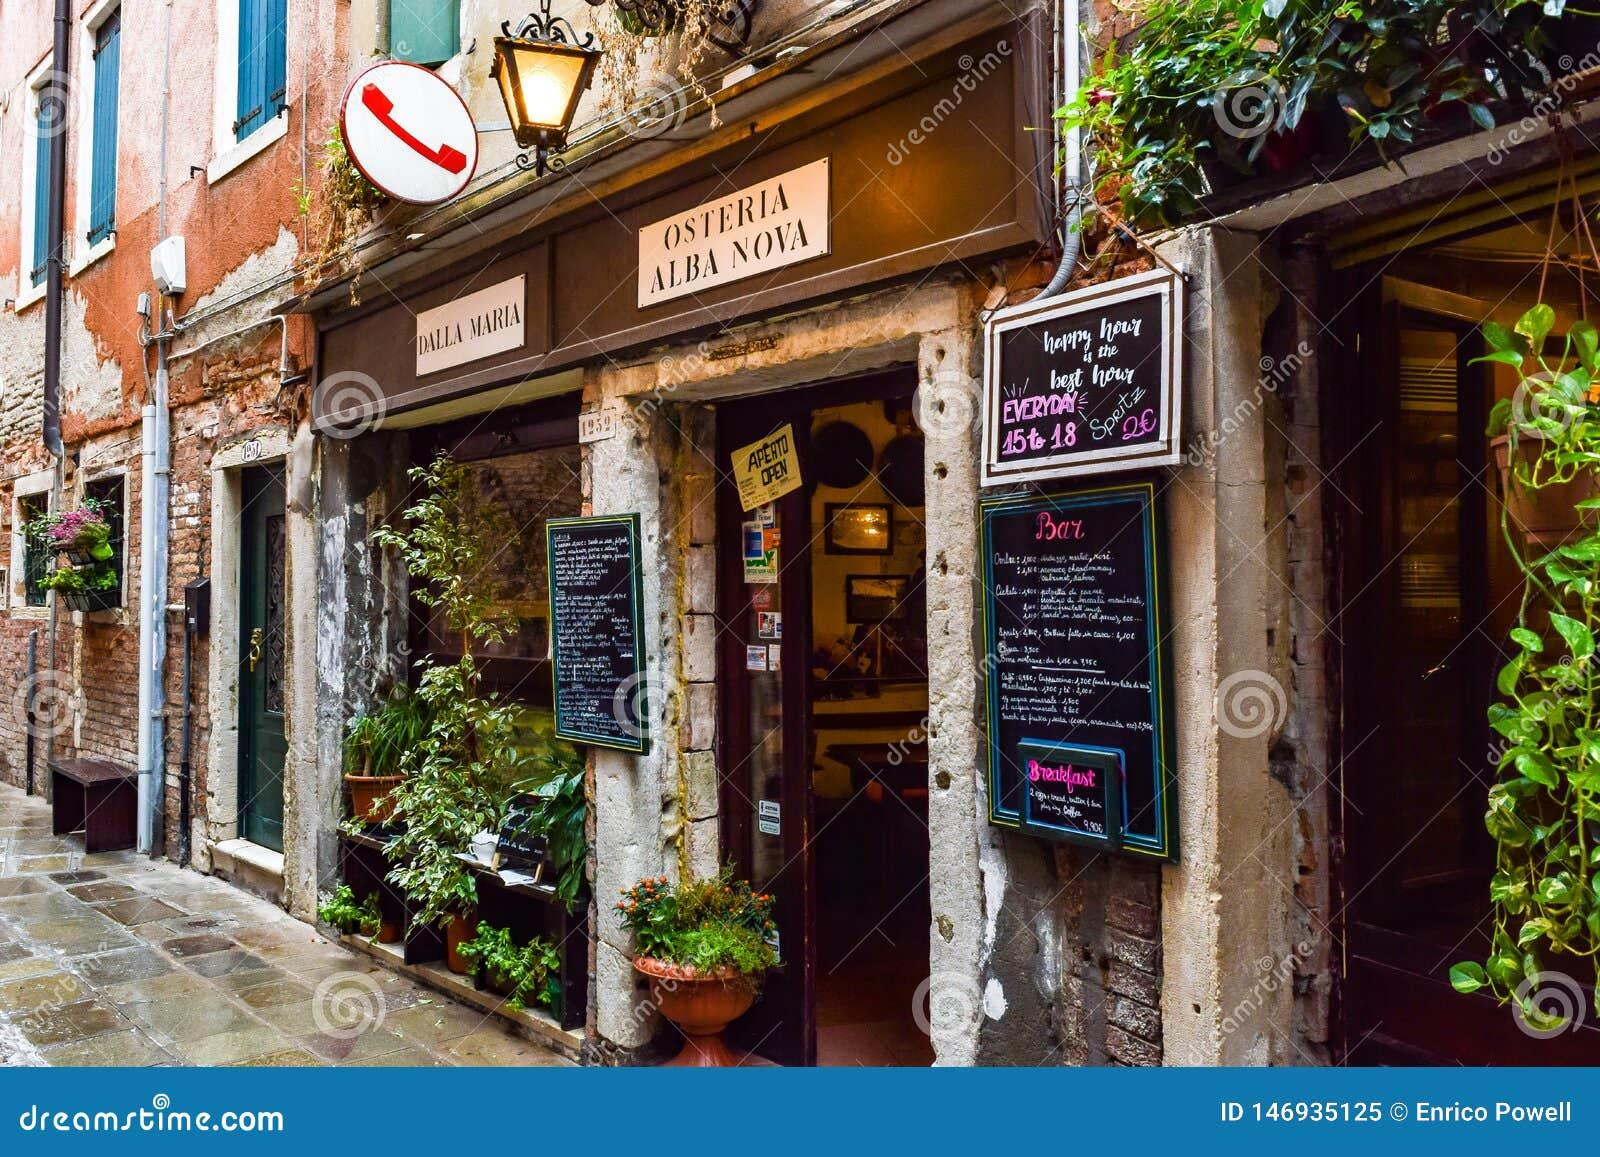 El dalla Maria de Osteria Alba Nova, una pequeña familia poseyó el restaurante en Venecia, Italia